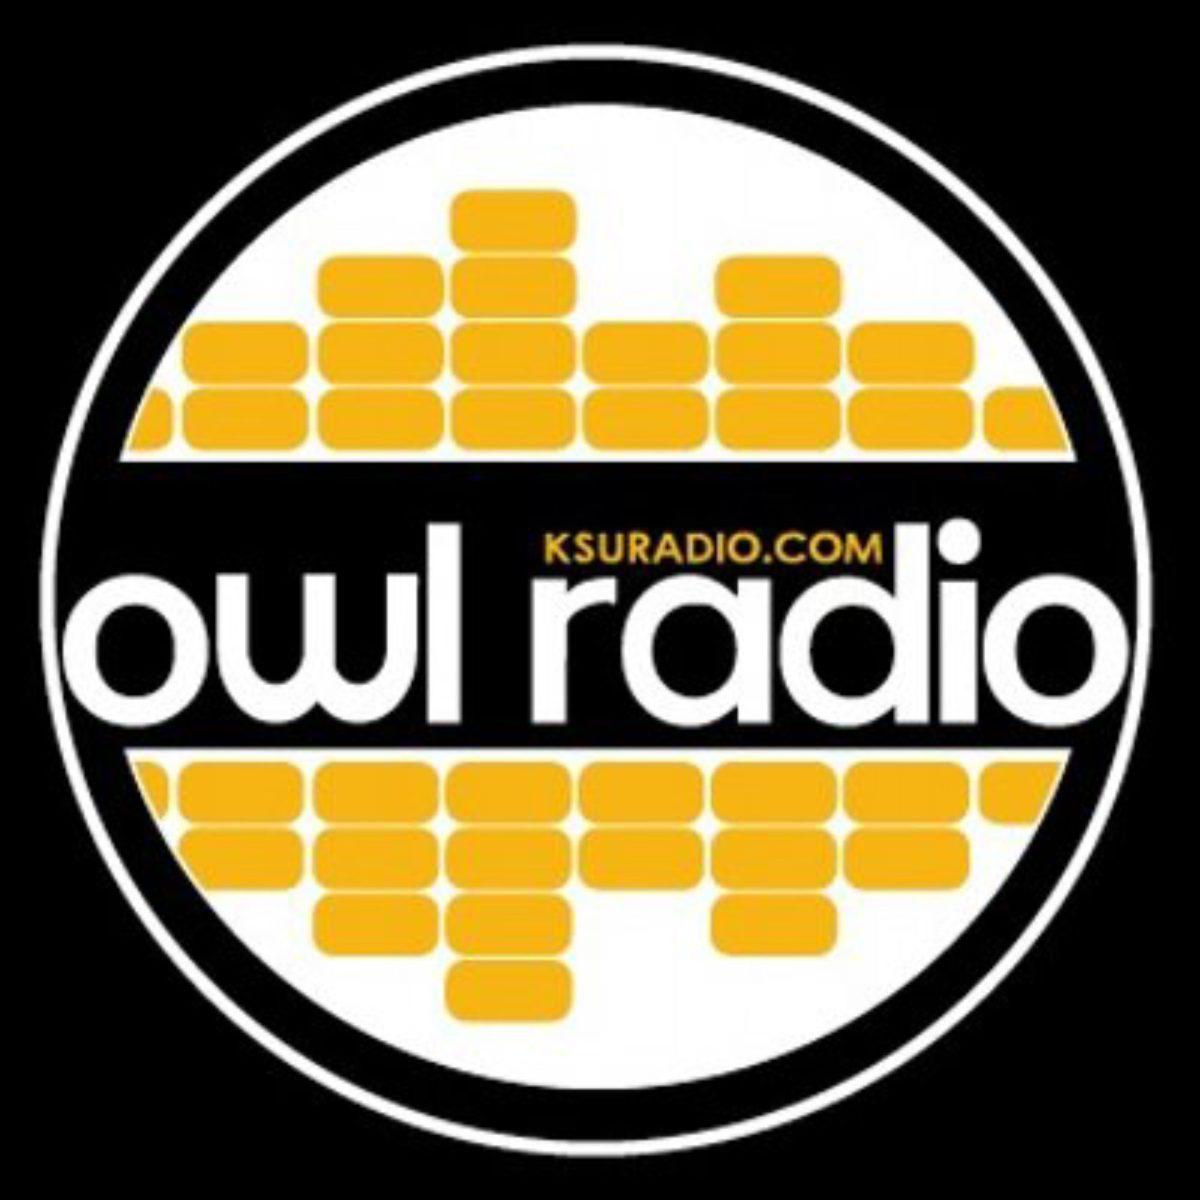 Owl Radio Kennesaw State University S Student Run Radio Station